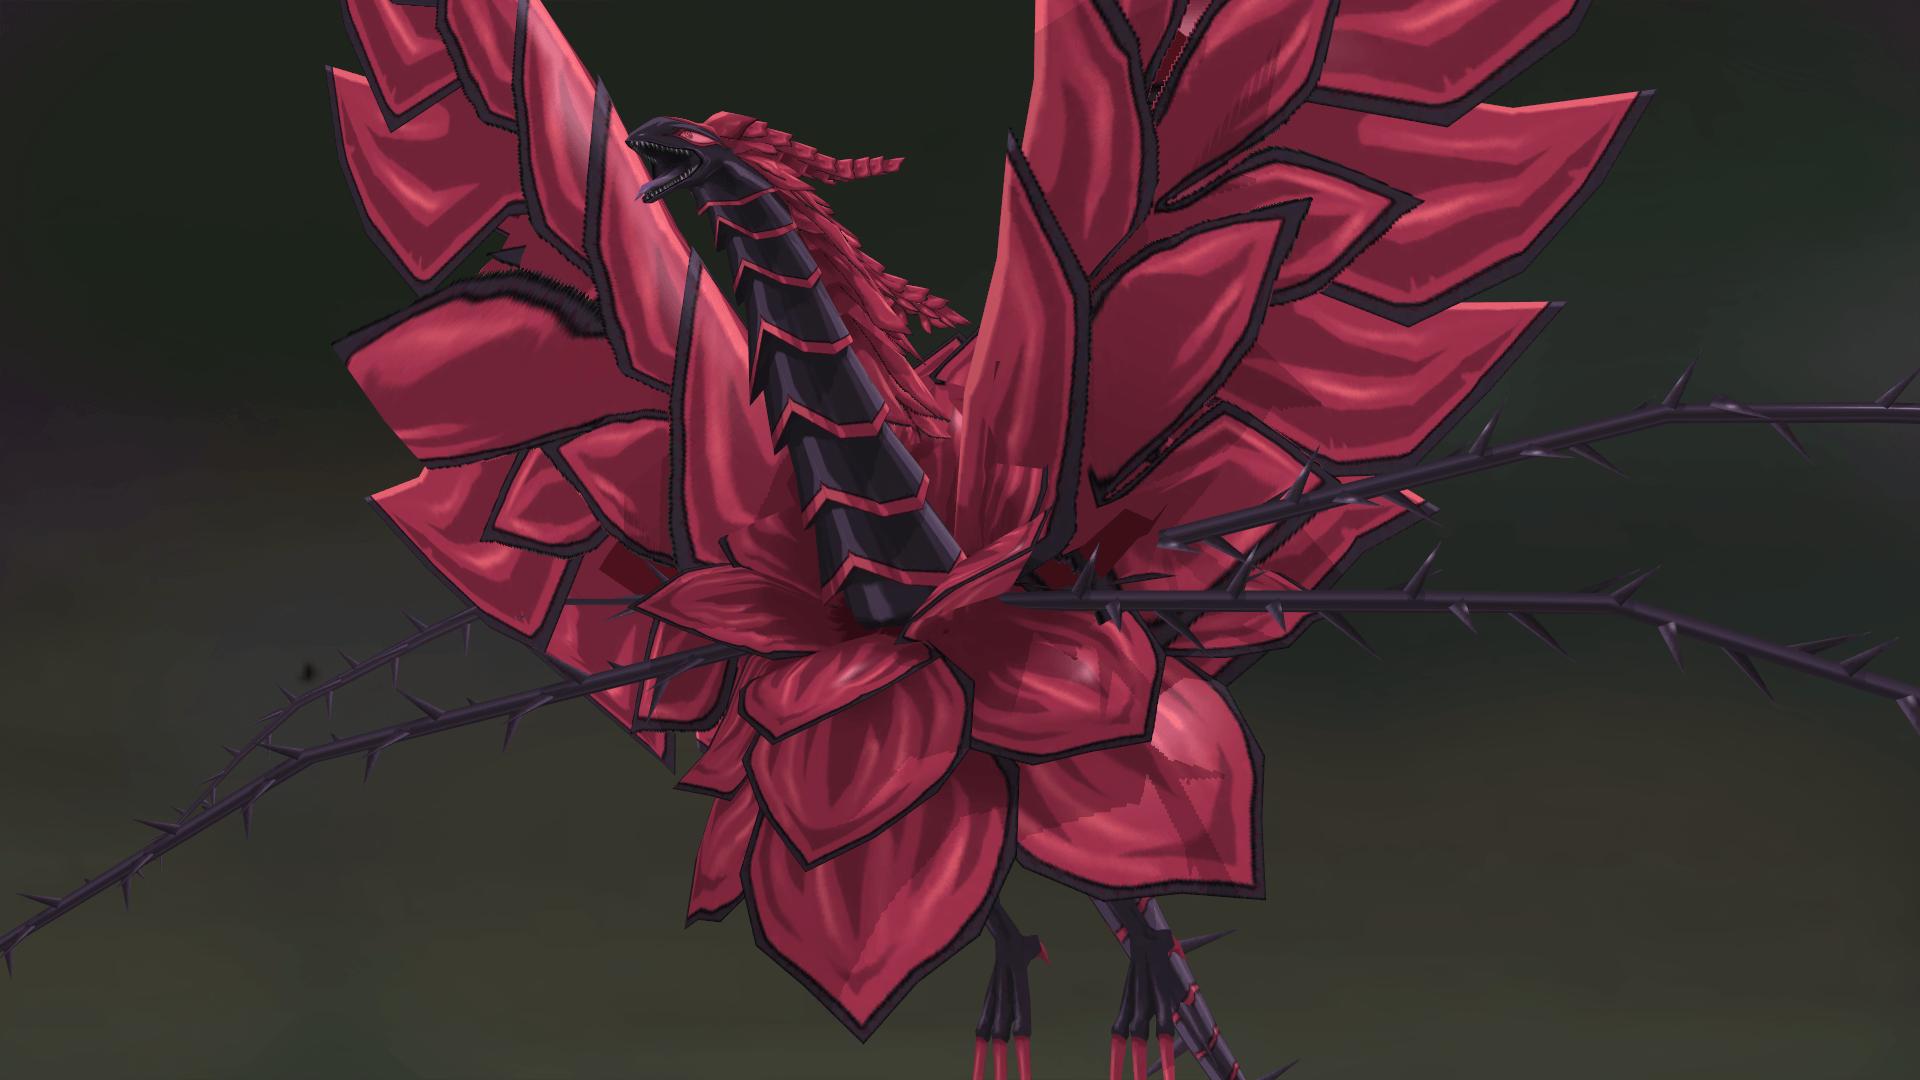 Black Rose Dragon Wallpapers - Top Free Black Rose Dragon Backgrounds - WallpaperAccess